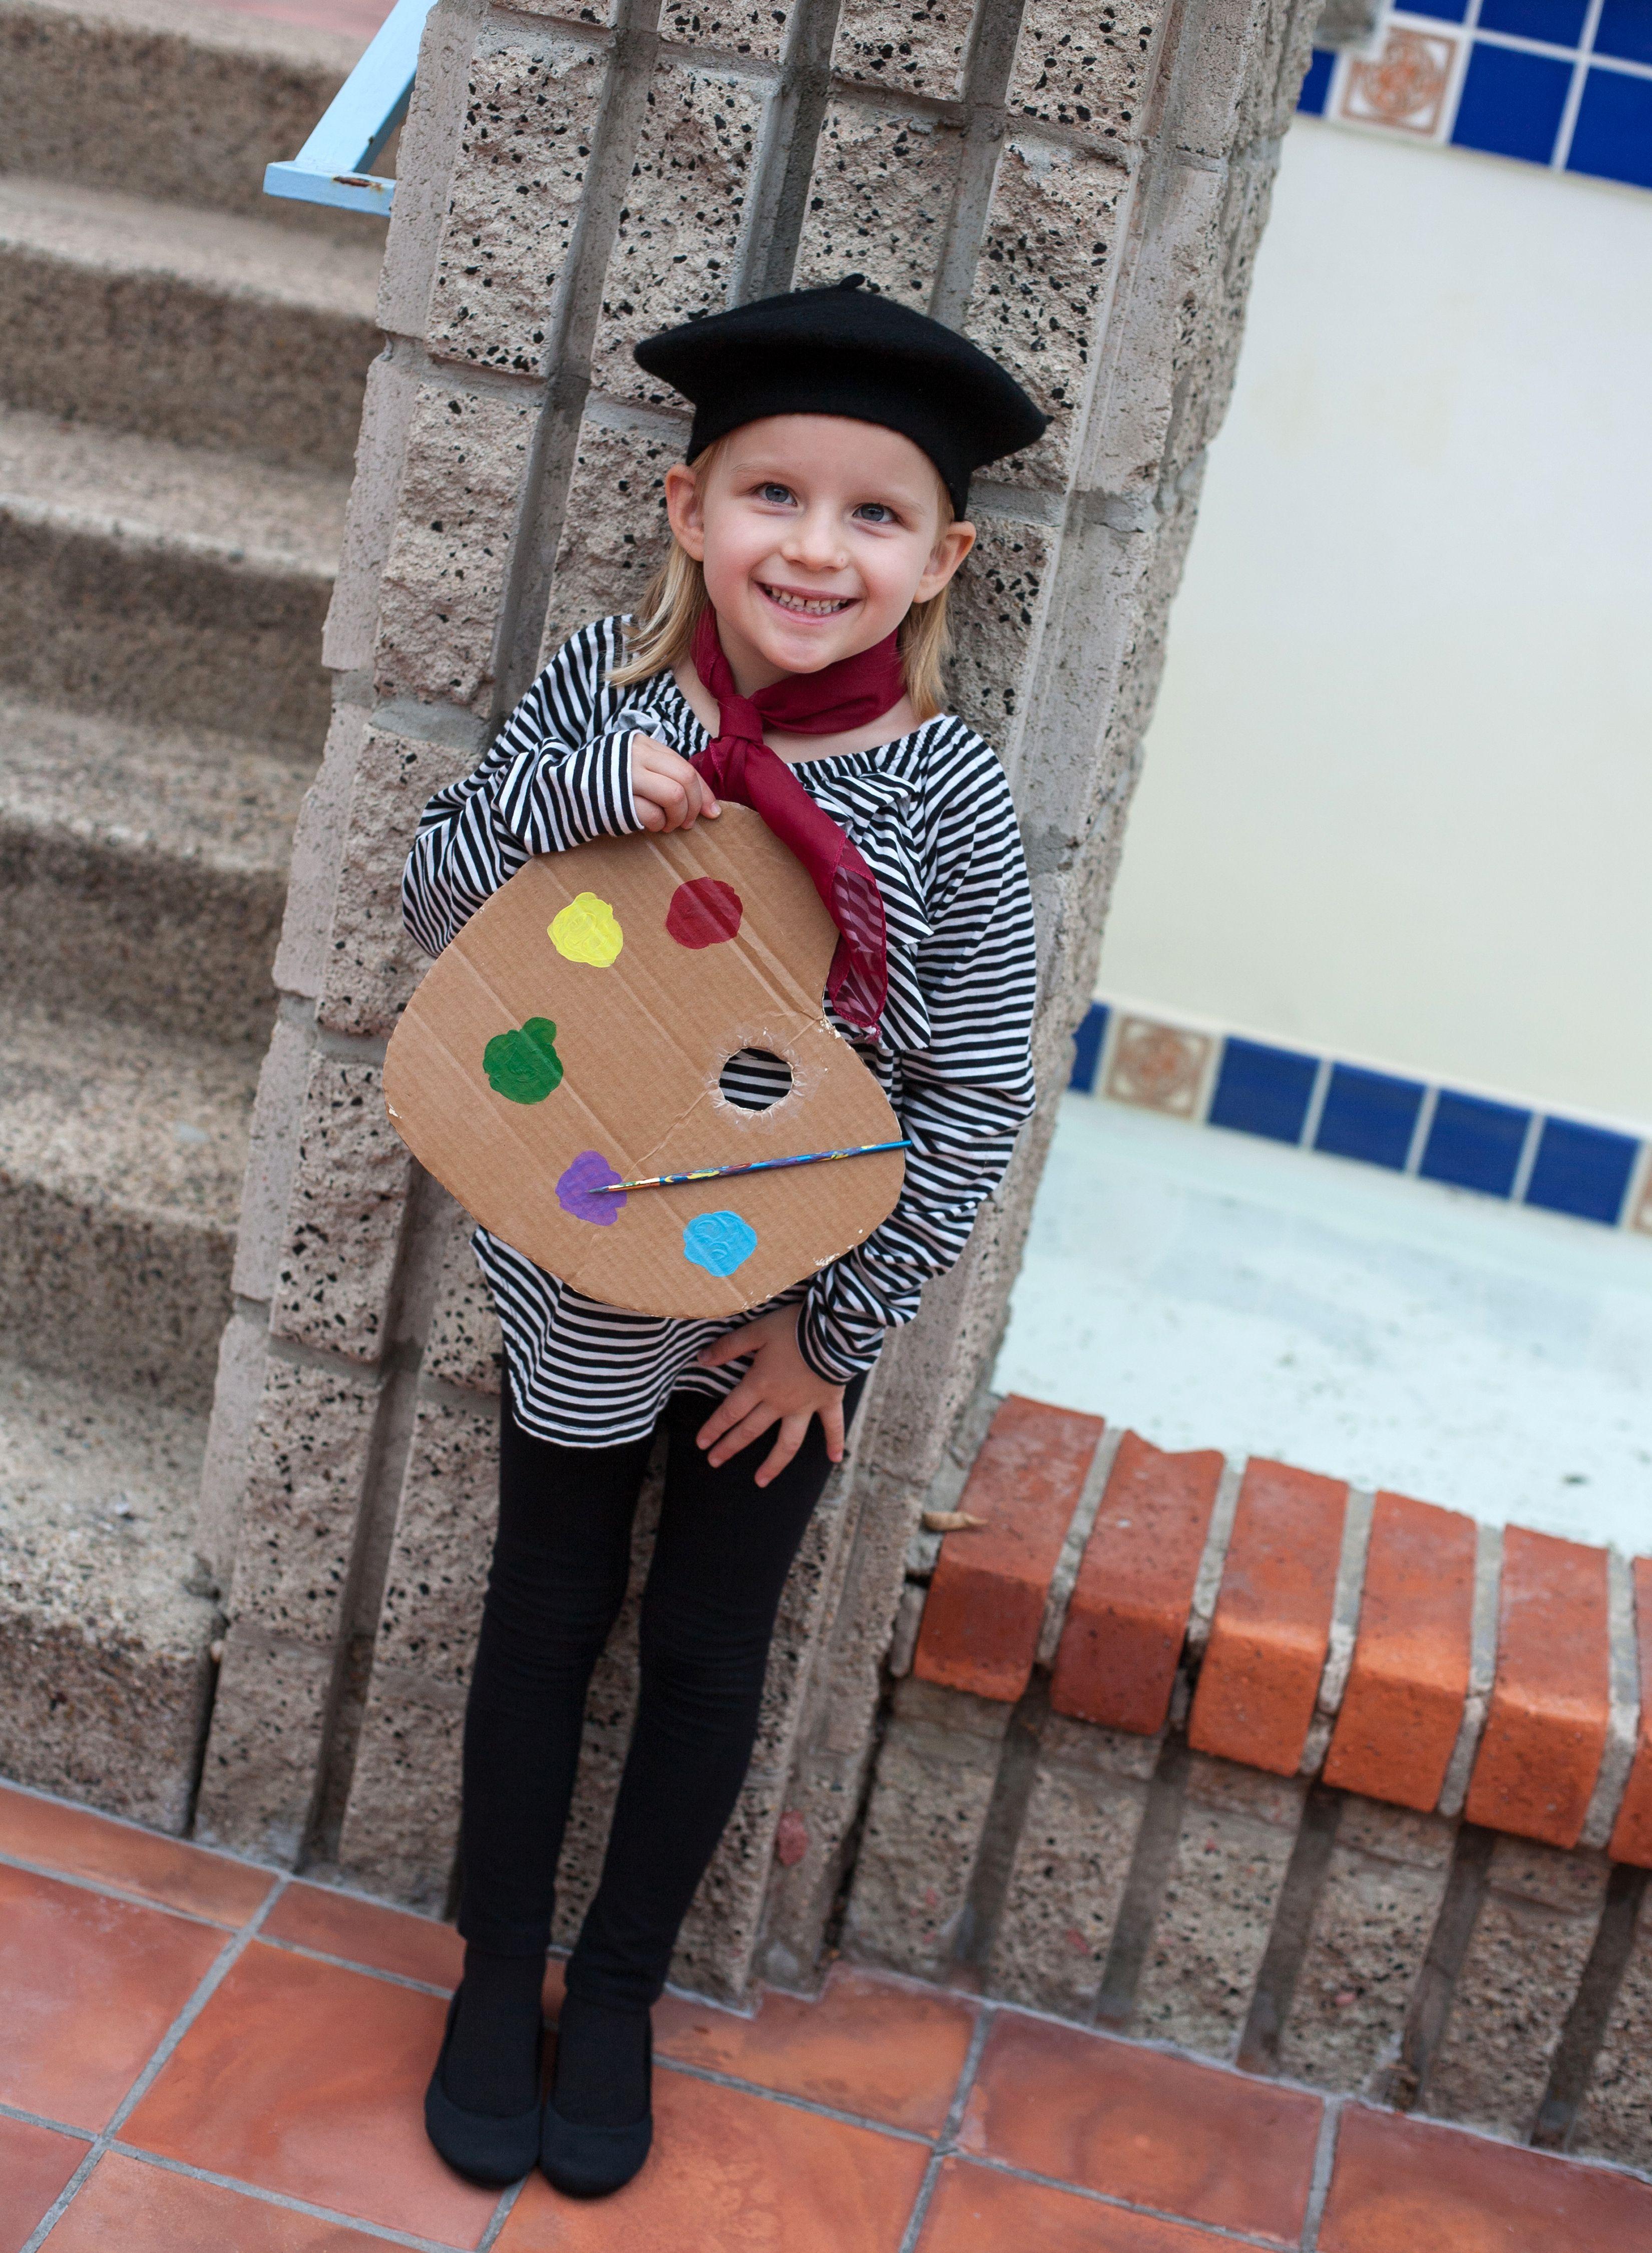 Diy French Painter Halloween Costume Halloween Costumes For Kids Family Halloween Costumes Kids Costumes